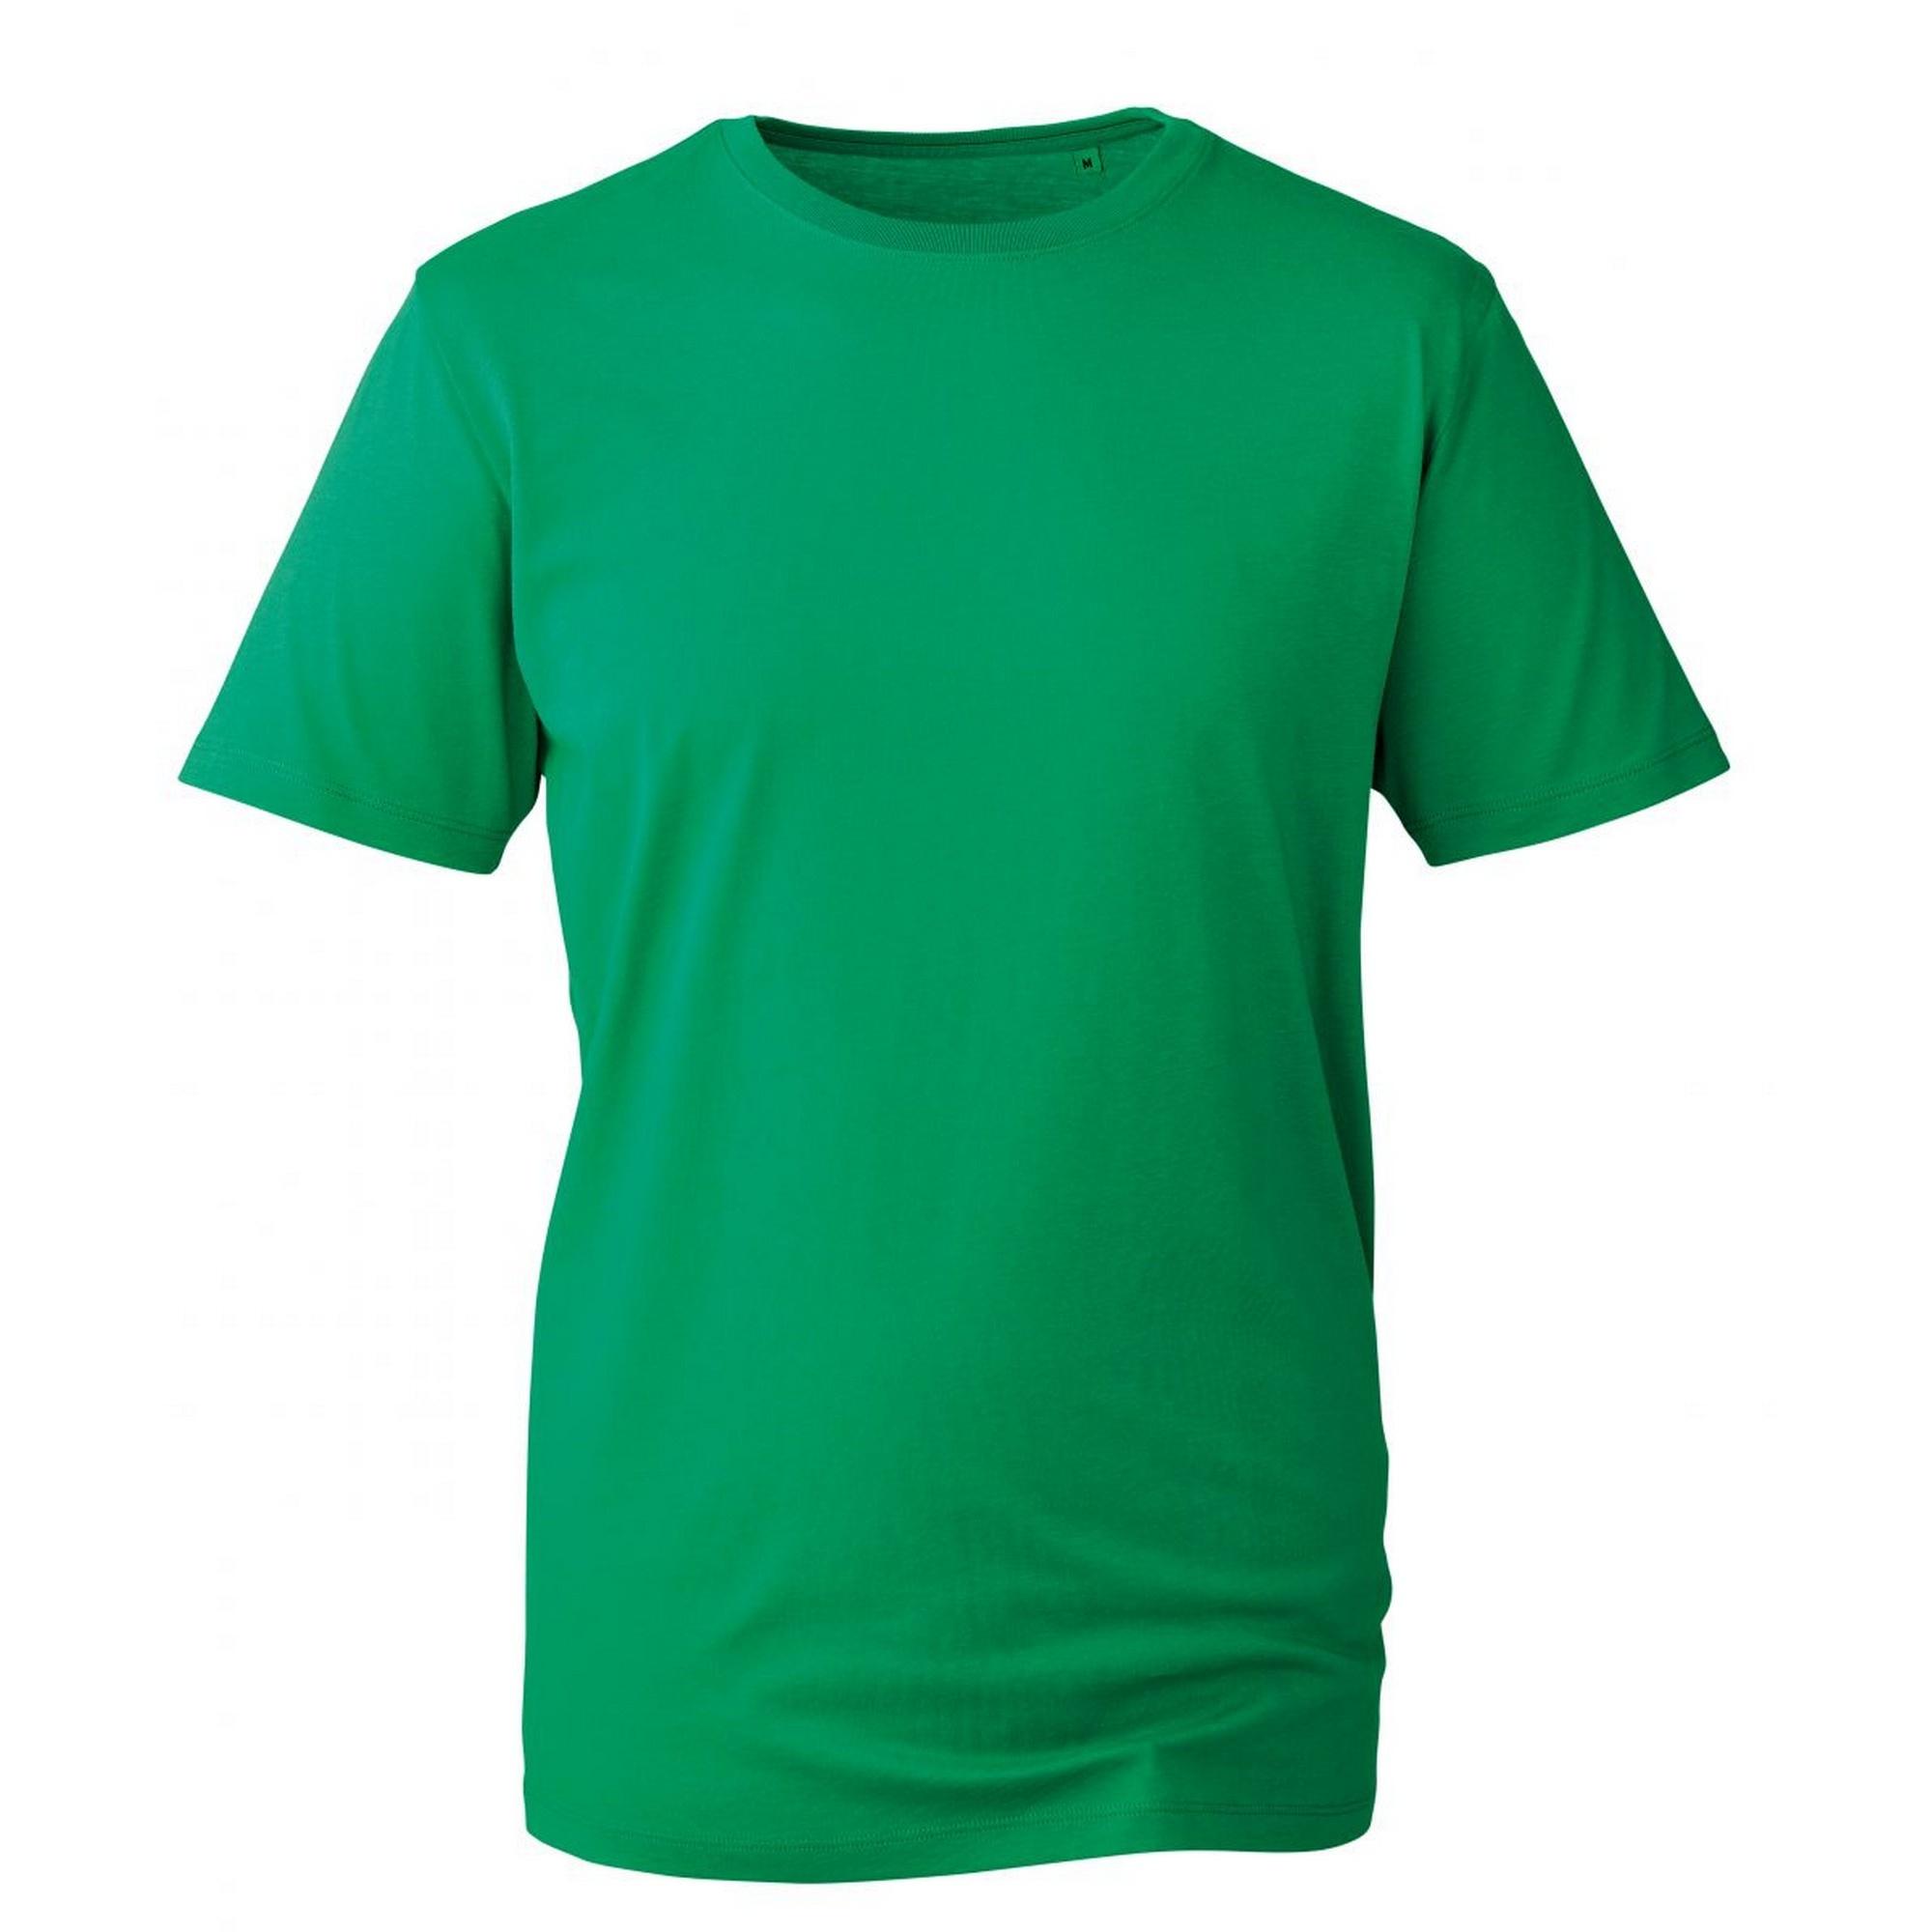 Anthem Mens Short Sleeve T-Shirt (M) (Kelly Green)